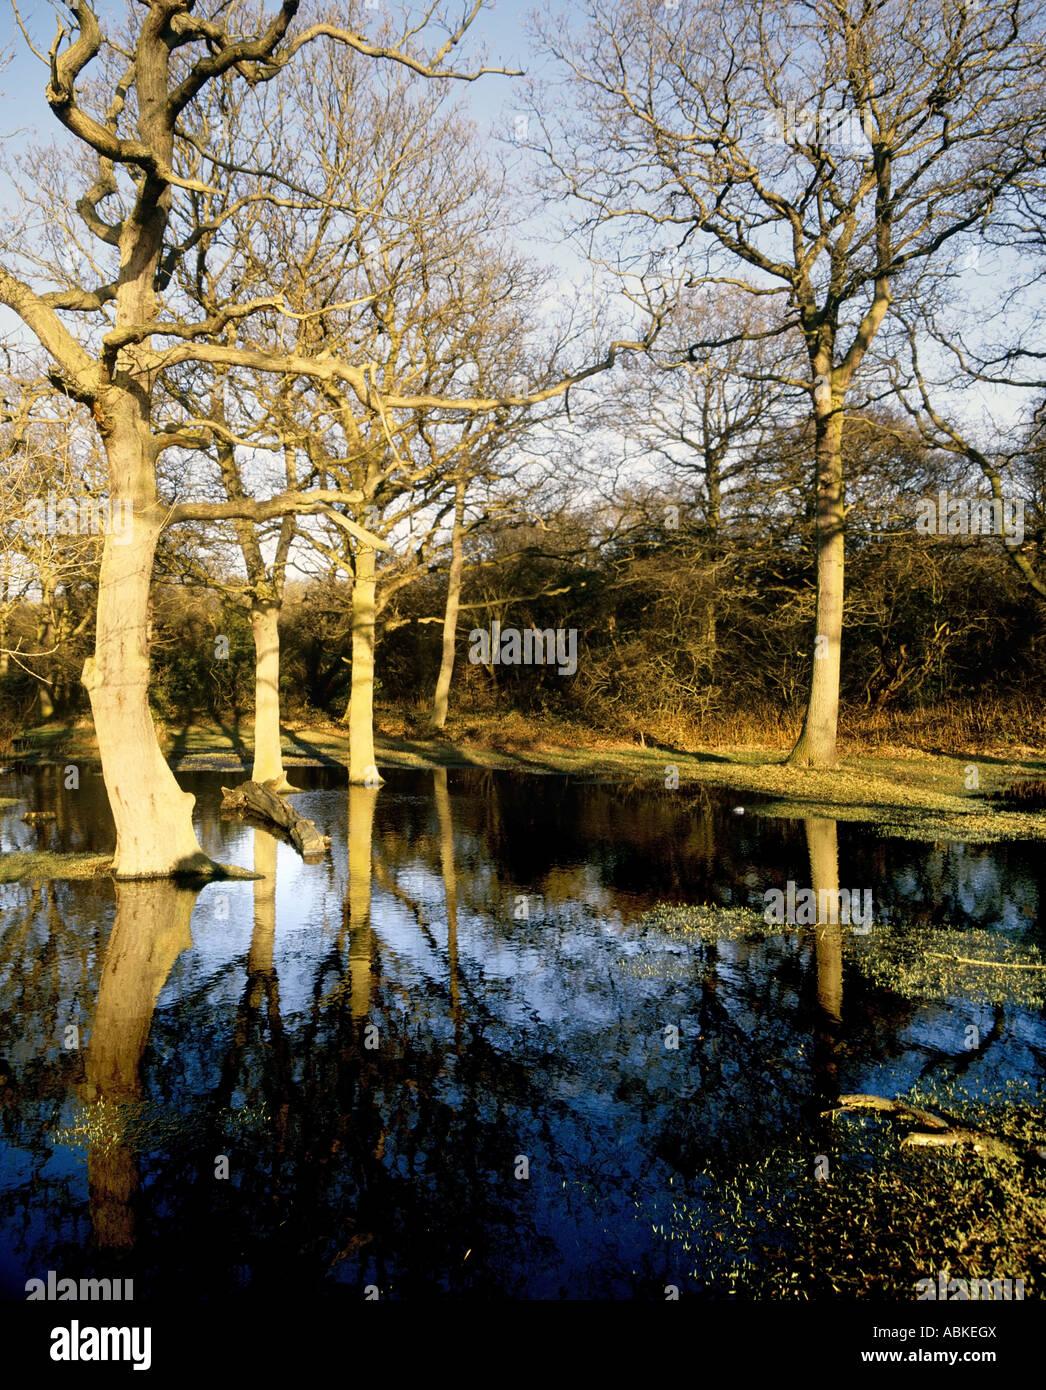 woodland trees flood floods flooded - Stock Image